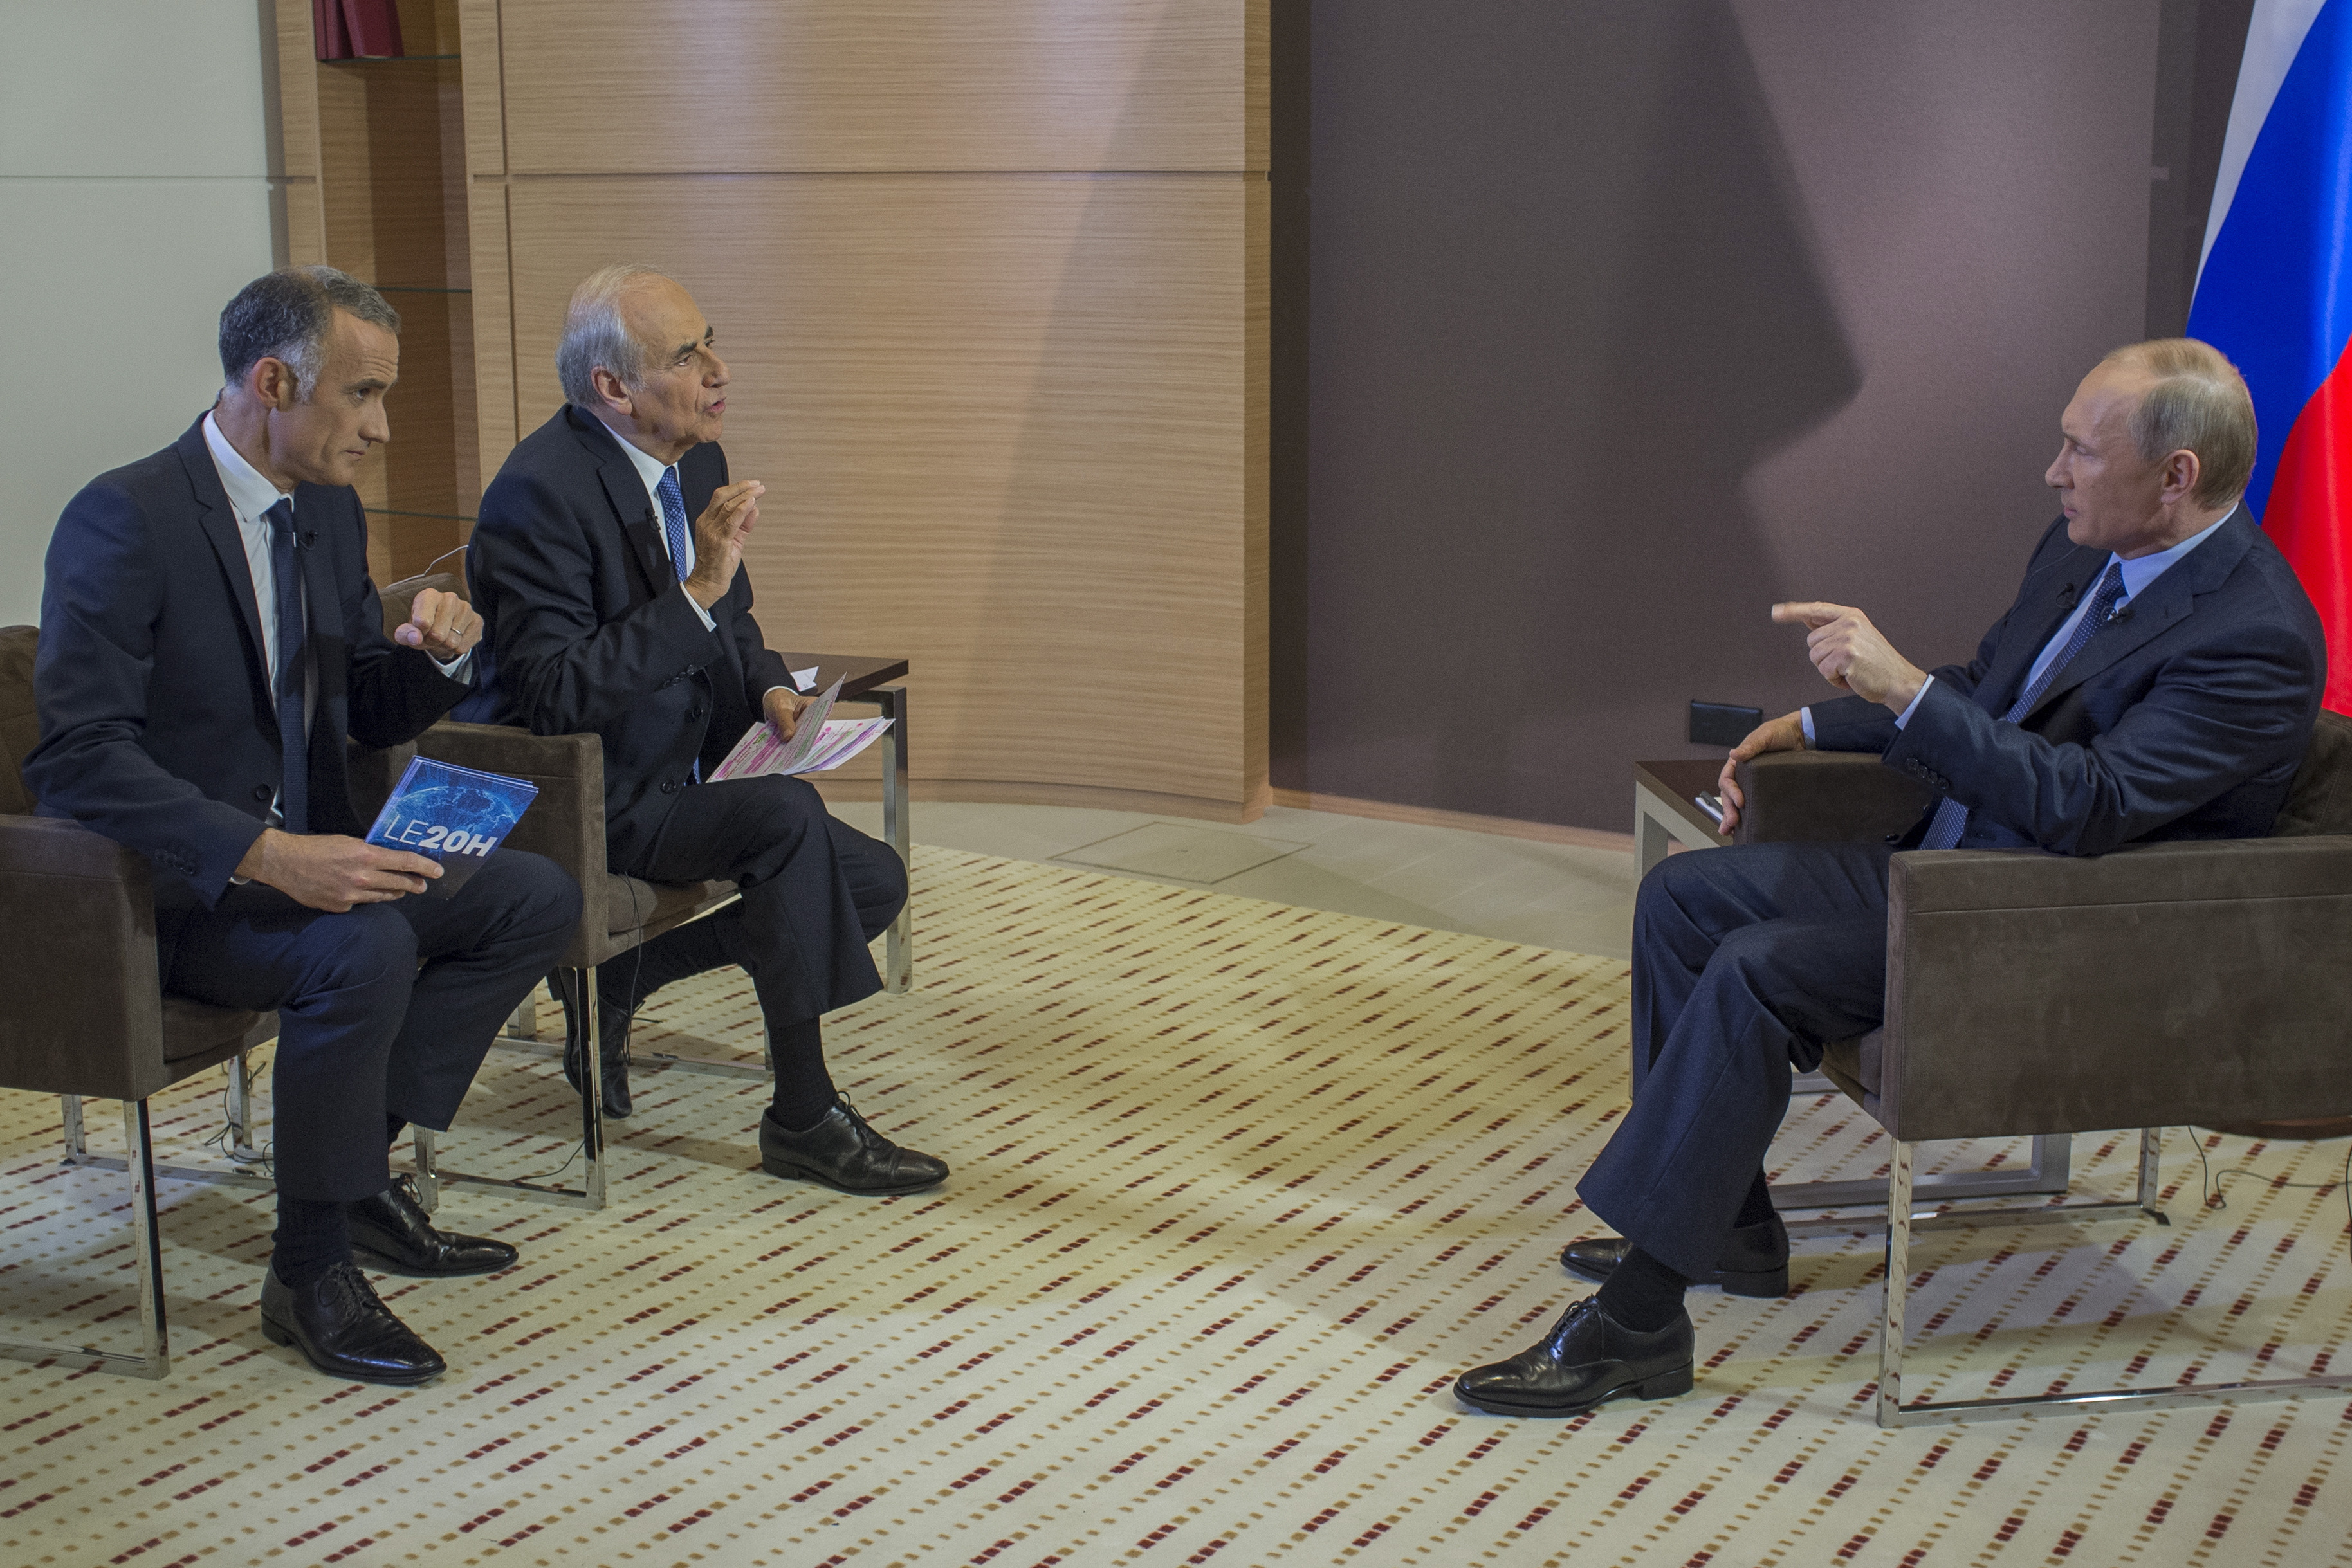 Владимир Путин во время интервью французским журналистам